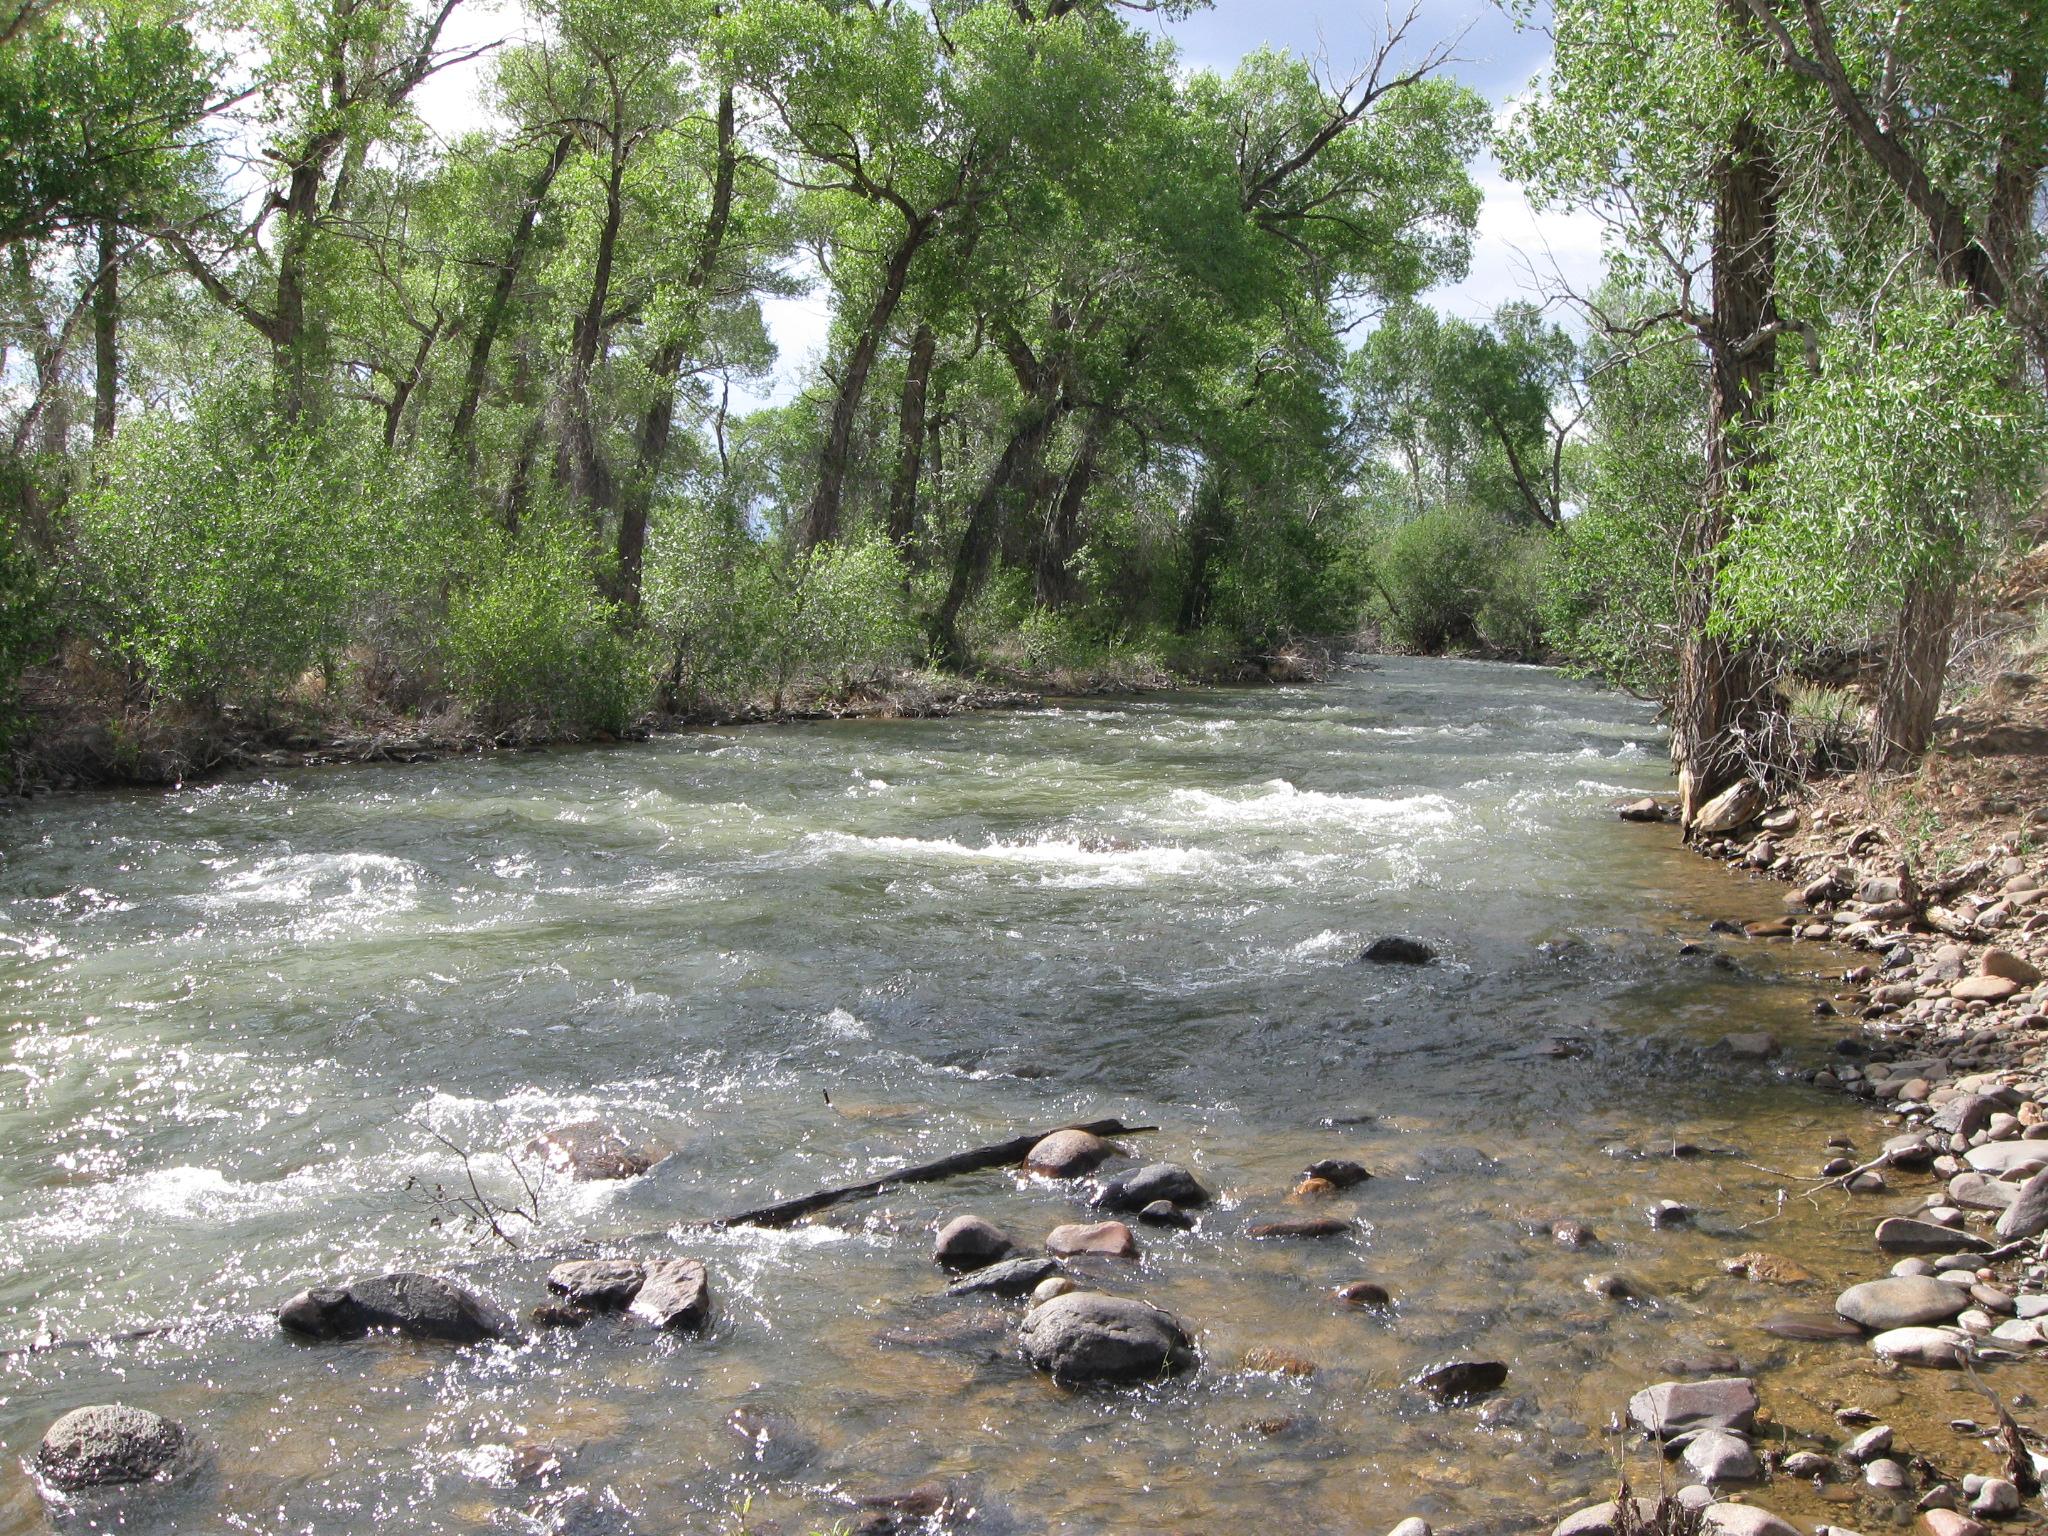 Alamosa River Estates Vacant Lots Trout Fishing